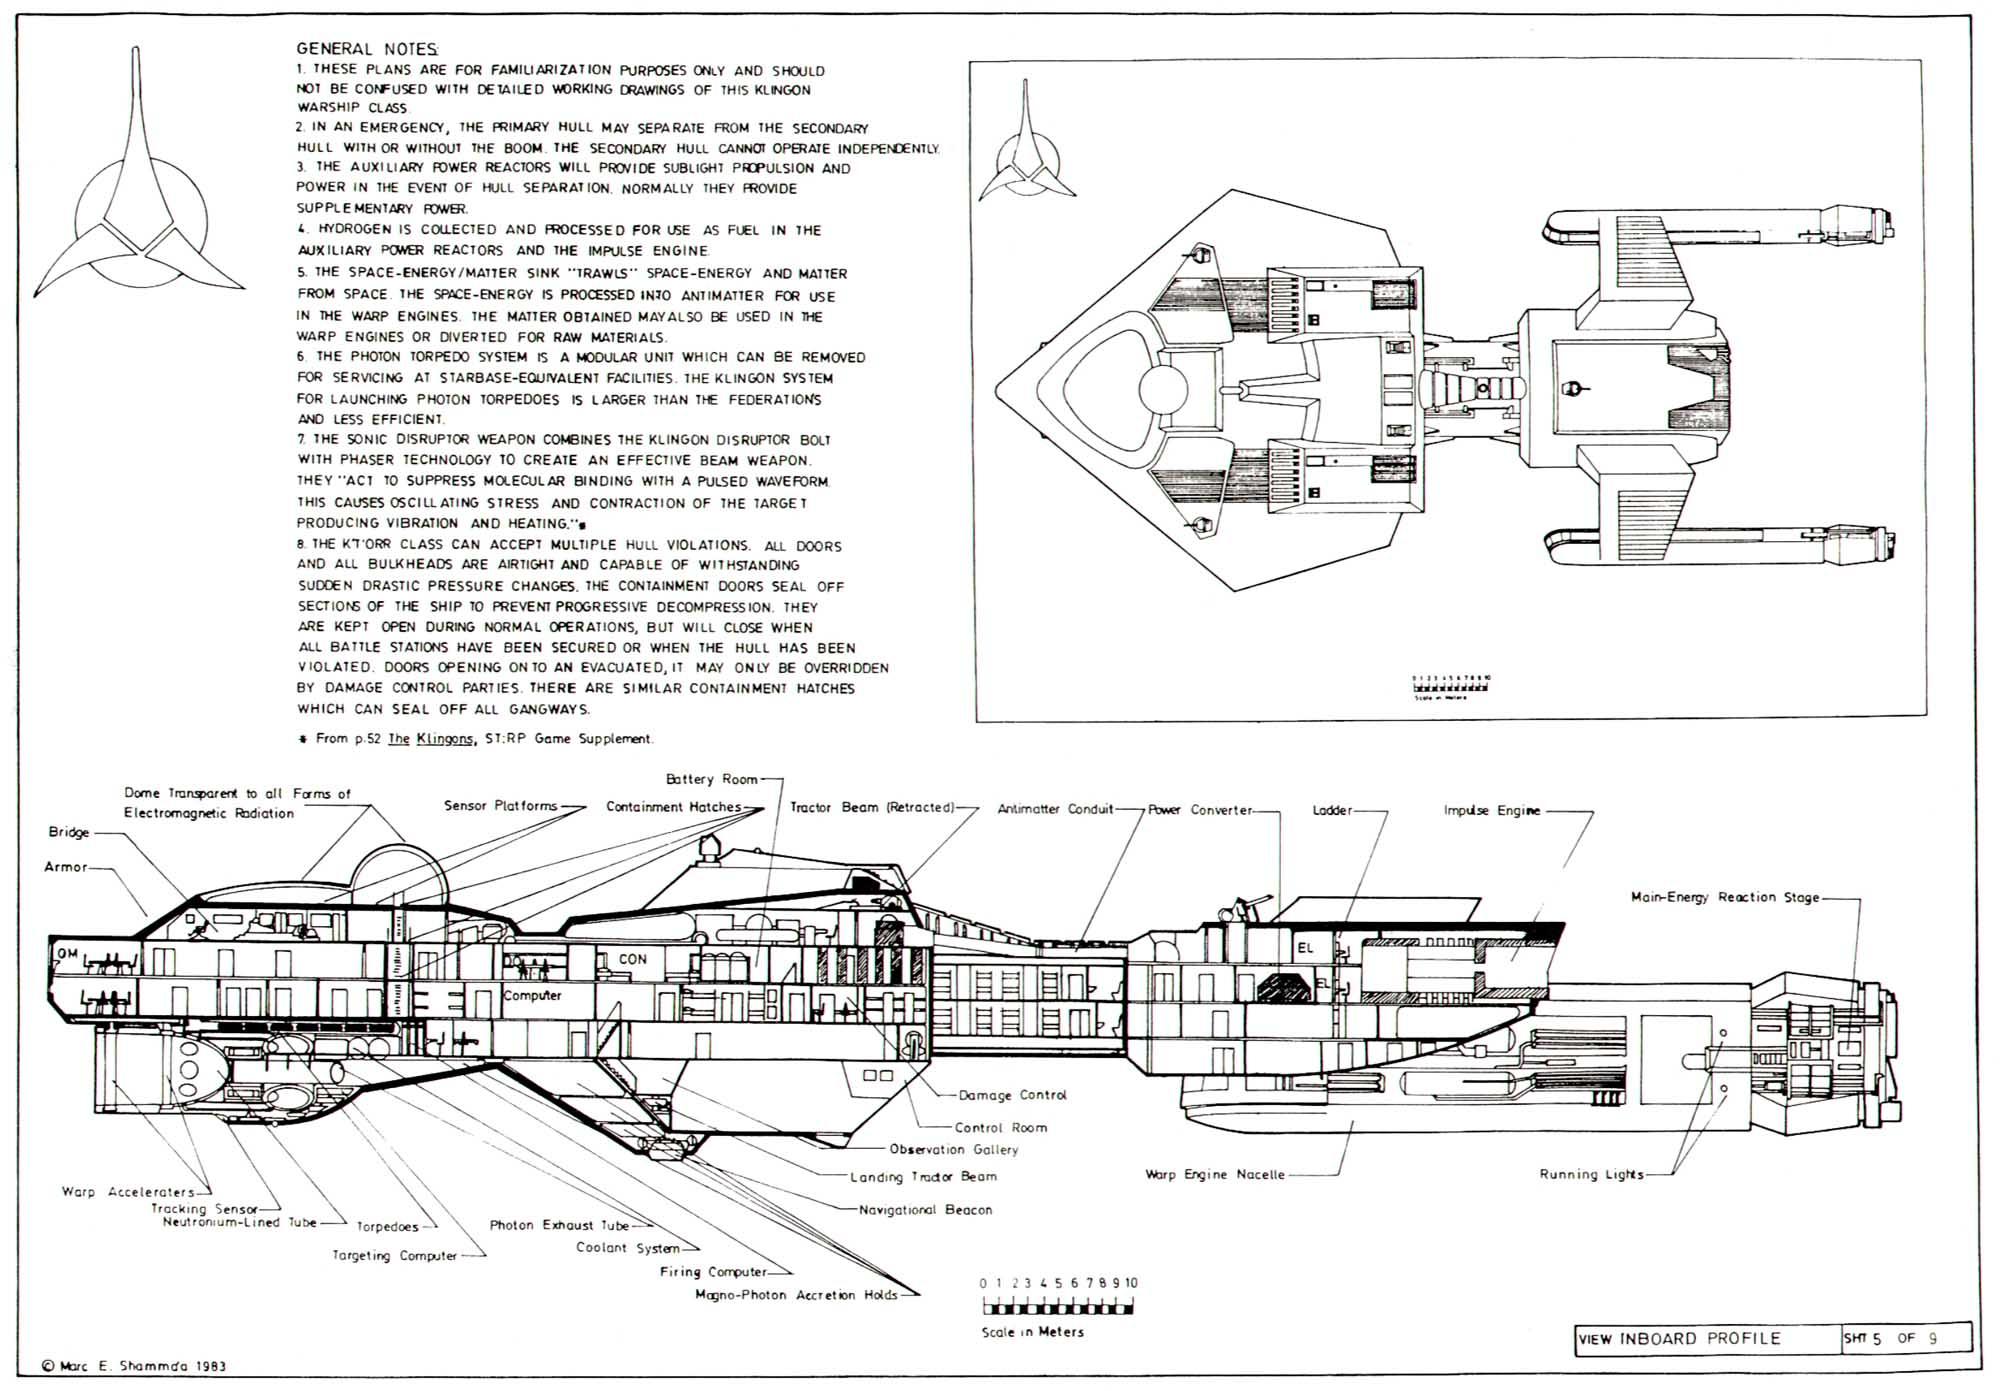 Star Trek Blueprints Klingon Destroyer K T Orr Class